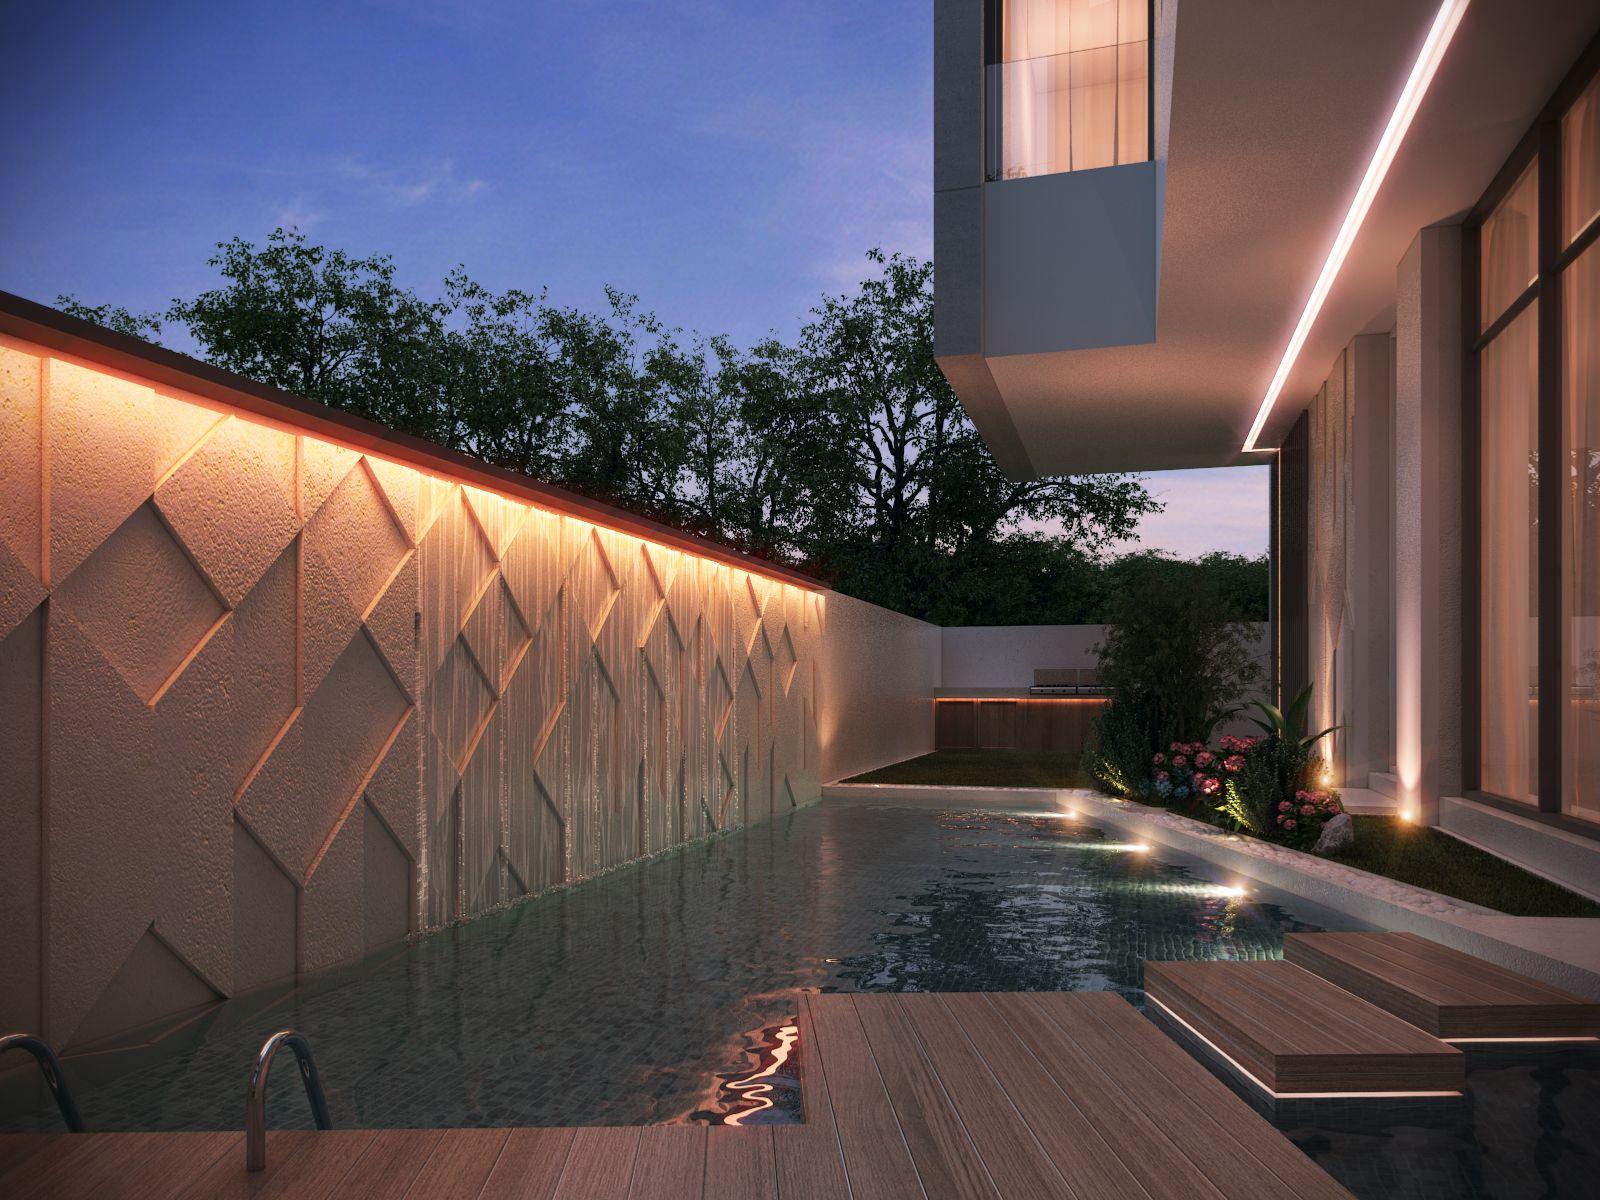 private villa 400 m kuwait by sarah sadeq architects